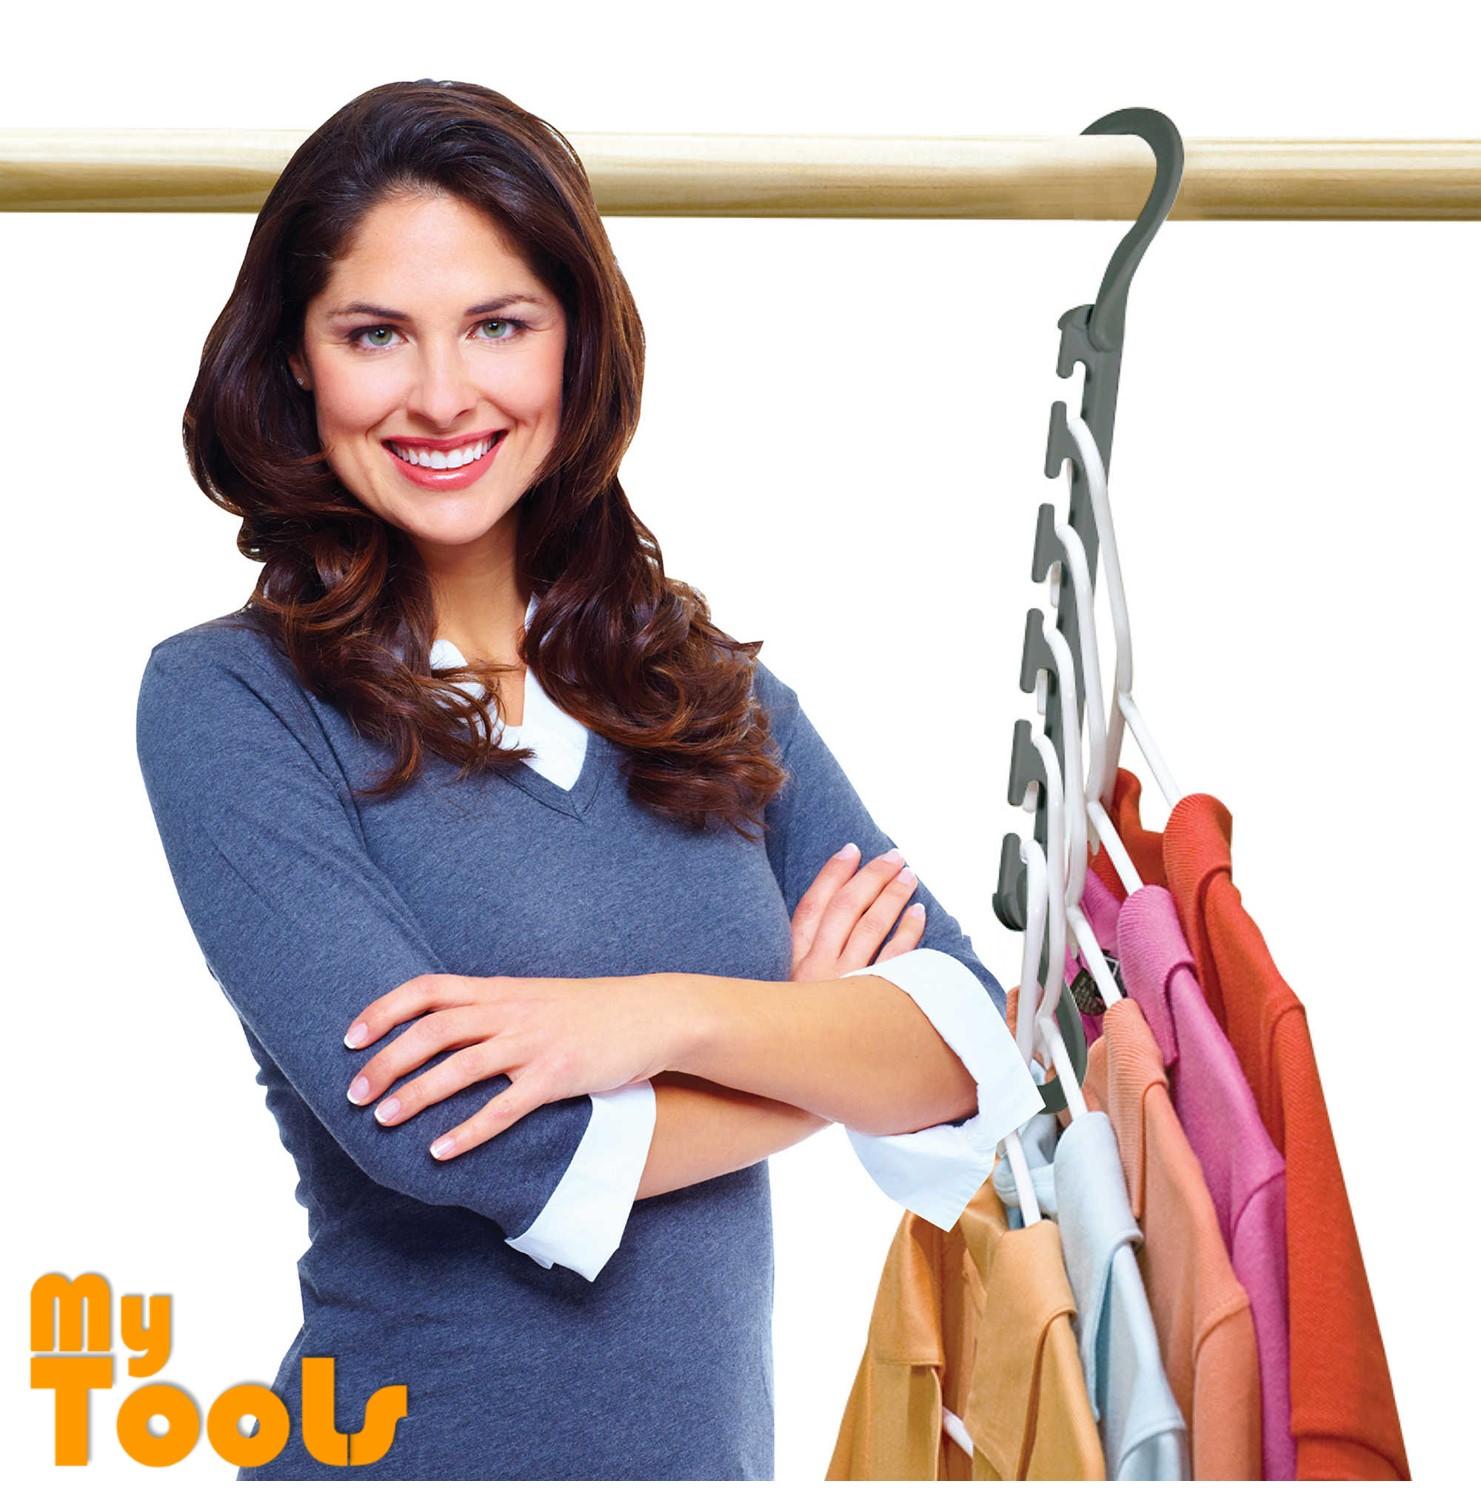 10 pcs Wonder Hanger Max 30 Pounds Stronger Triples Closet Space Clothing Wardrobe